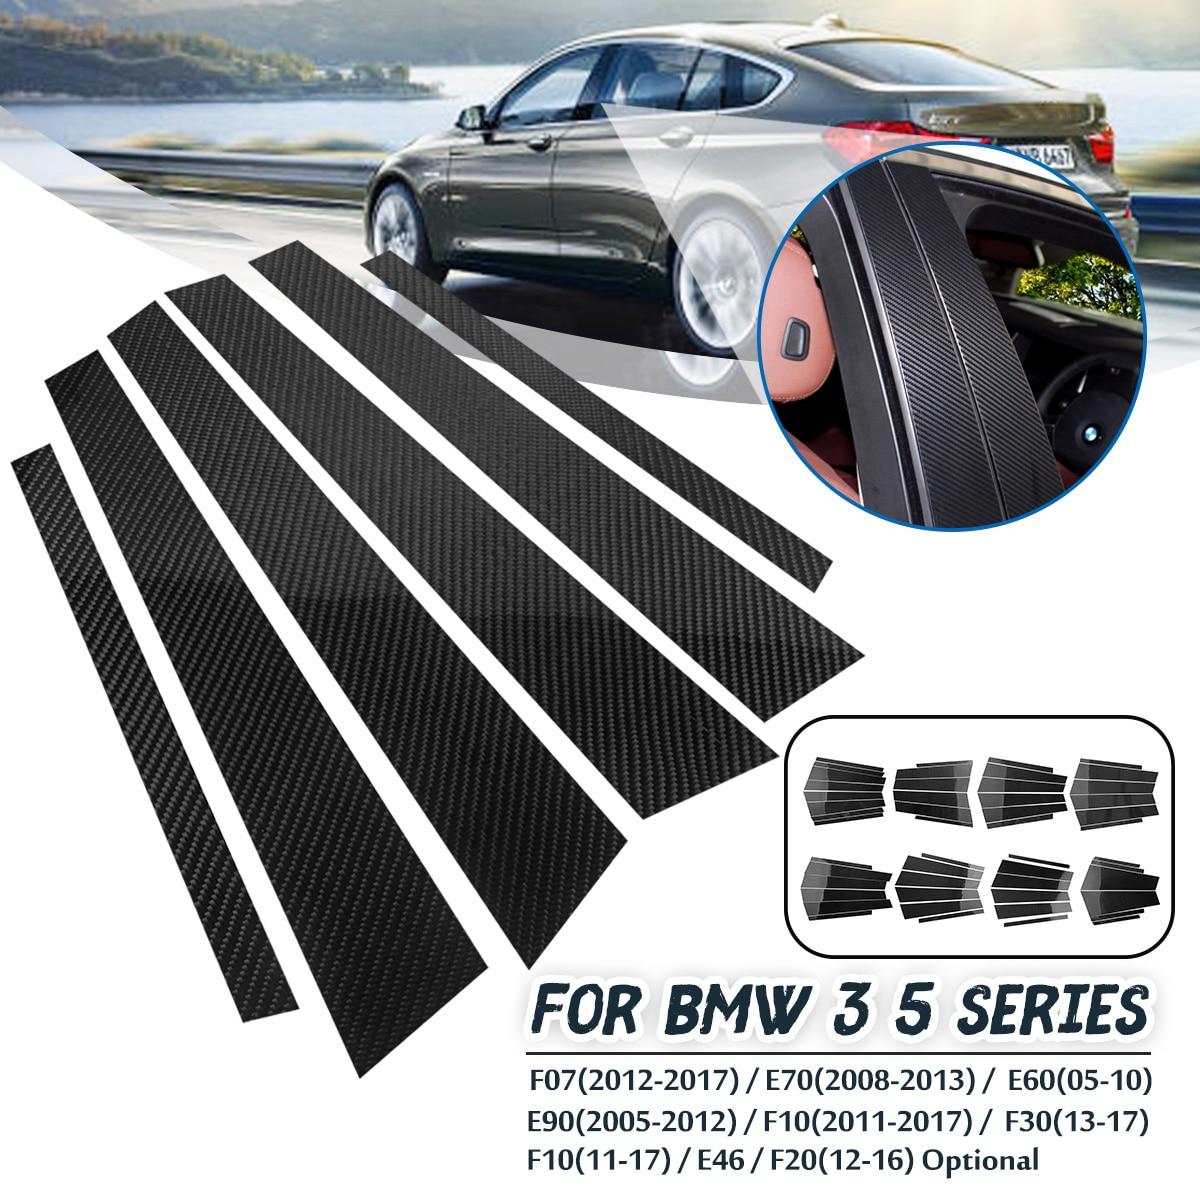 Car Window B-pillars Molding Trim Carbon Fiber Stickers for BMW 3 5 Series F07 E70 E90 F10 E60 F30 F10 E46 F20 Car Styling car styling central handbrake auto h button left side decorative cover trim for bmw 5 6 7 series f10 gt f07 auto accessories